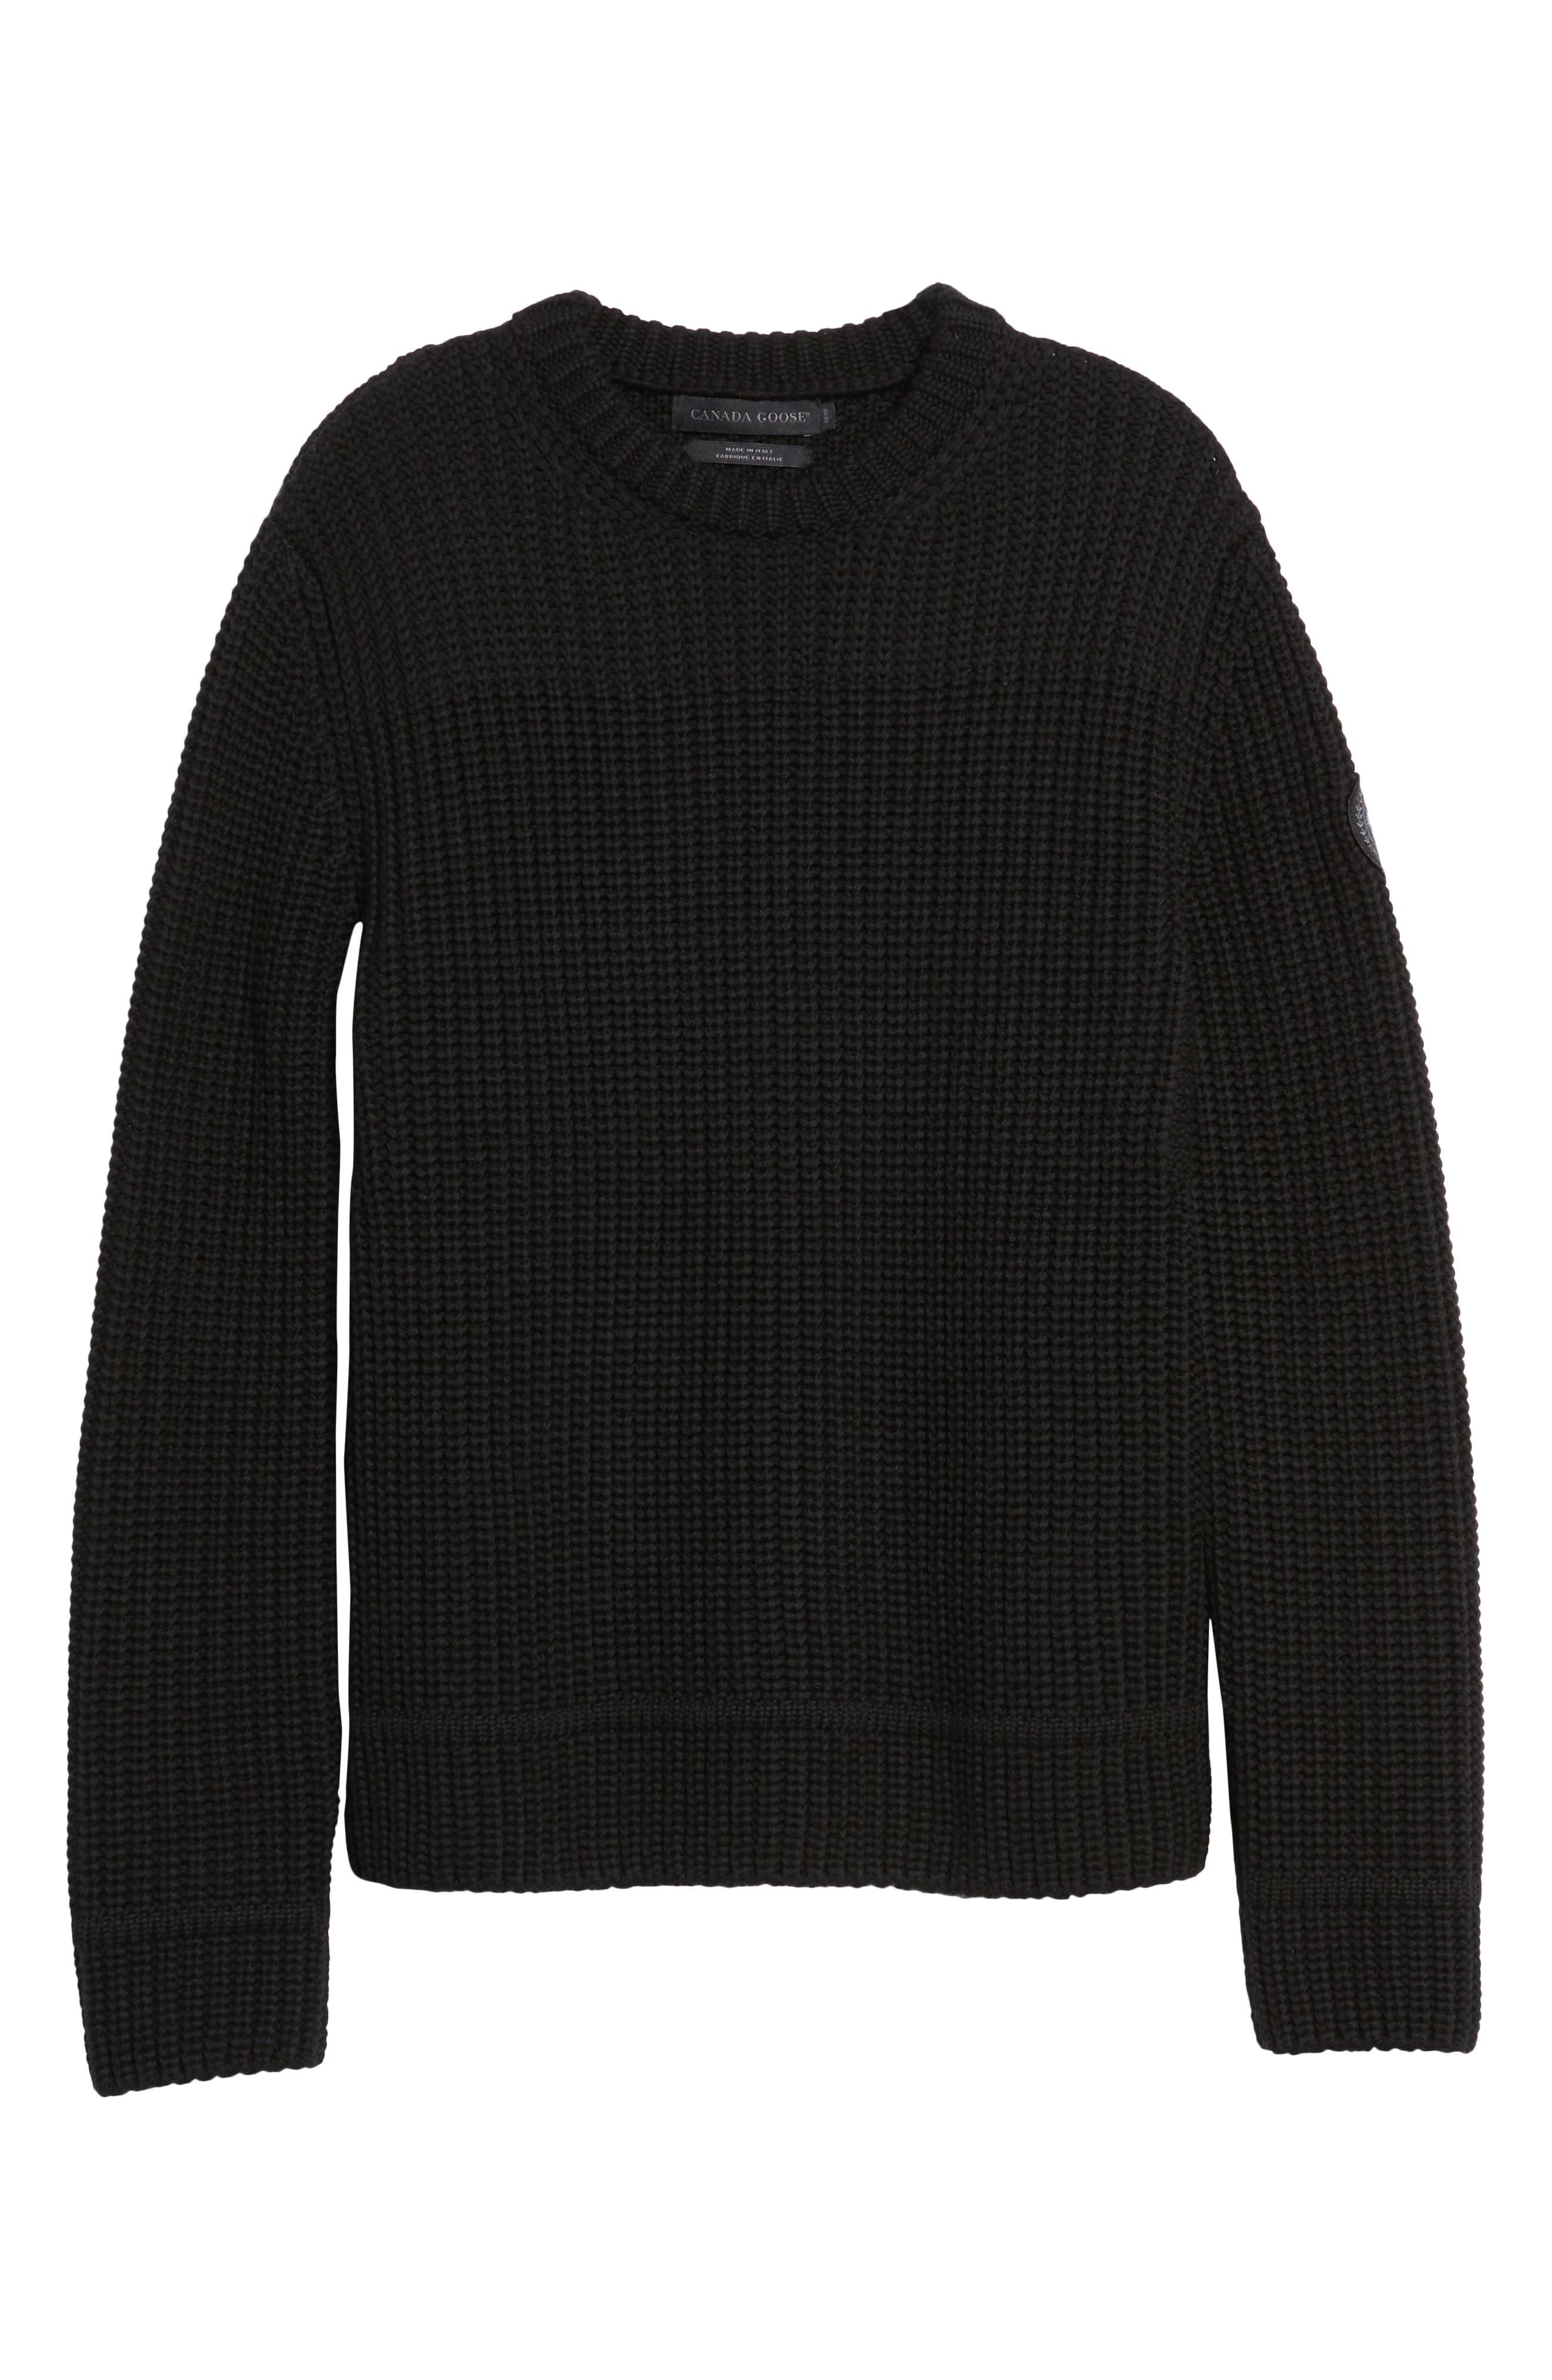 Galloway Regular Fit Merino Wool Sweater,                             Alternate thumbnail 6, color,                             BLACK